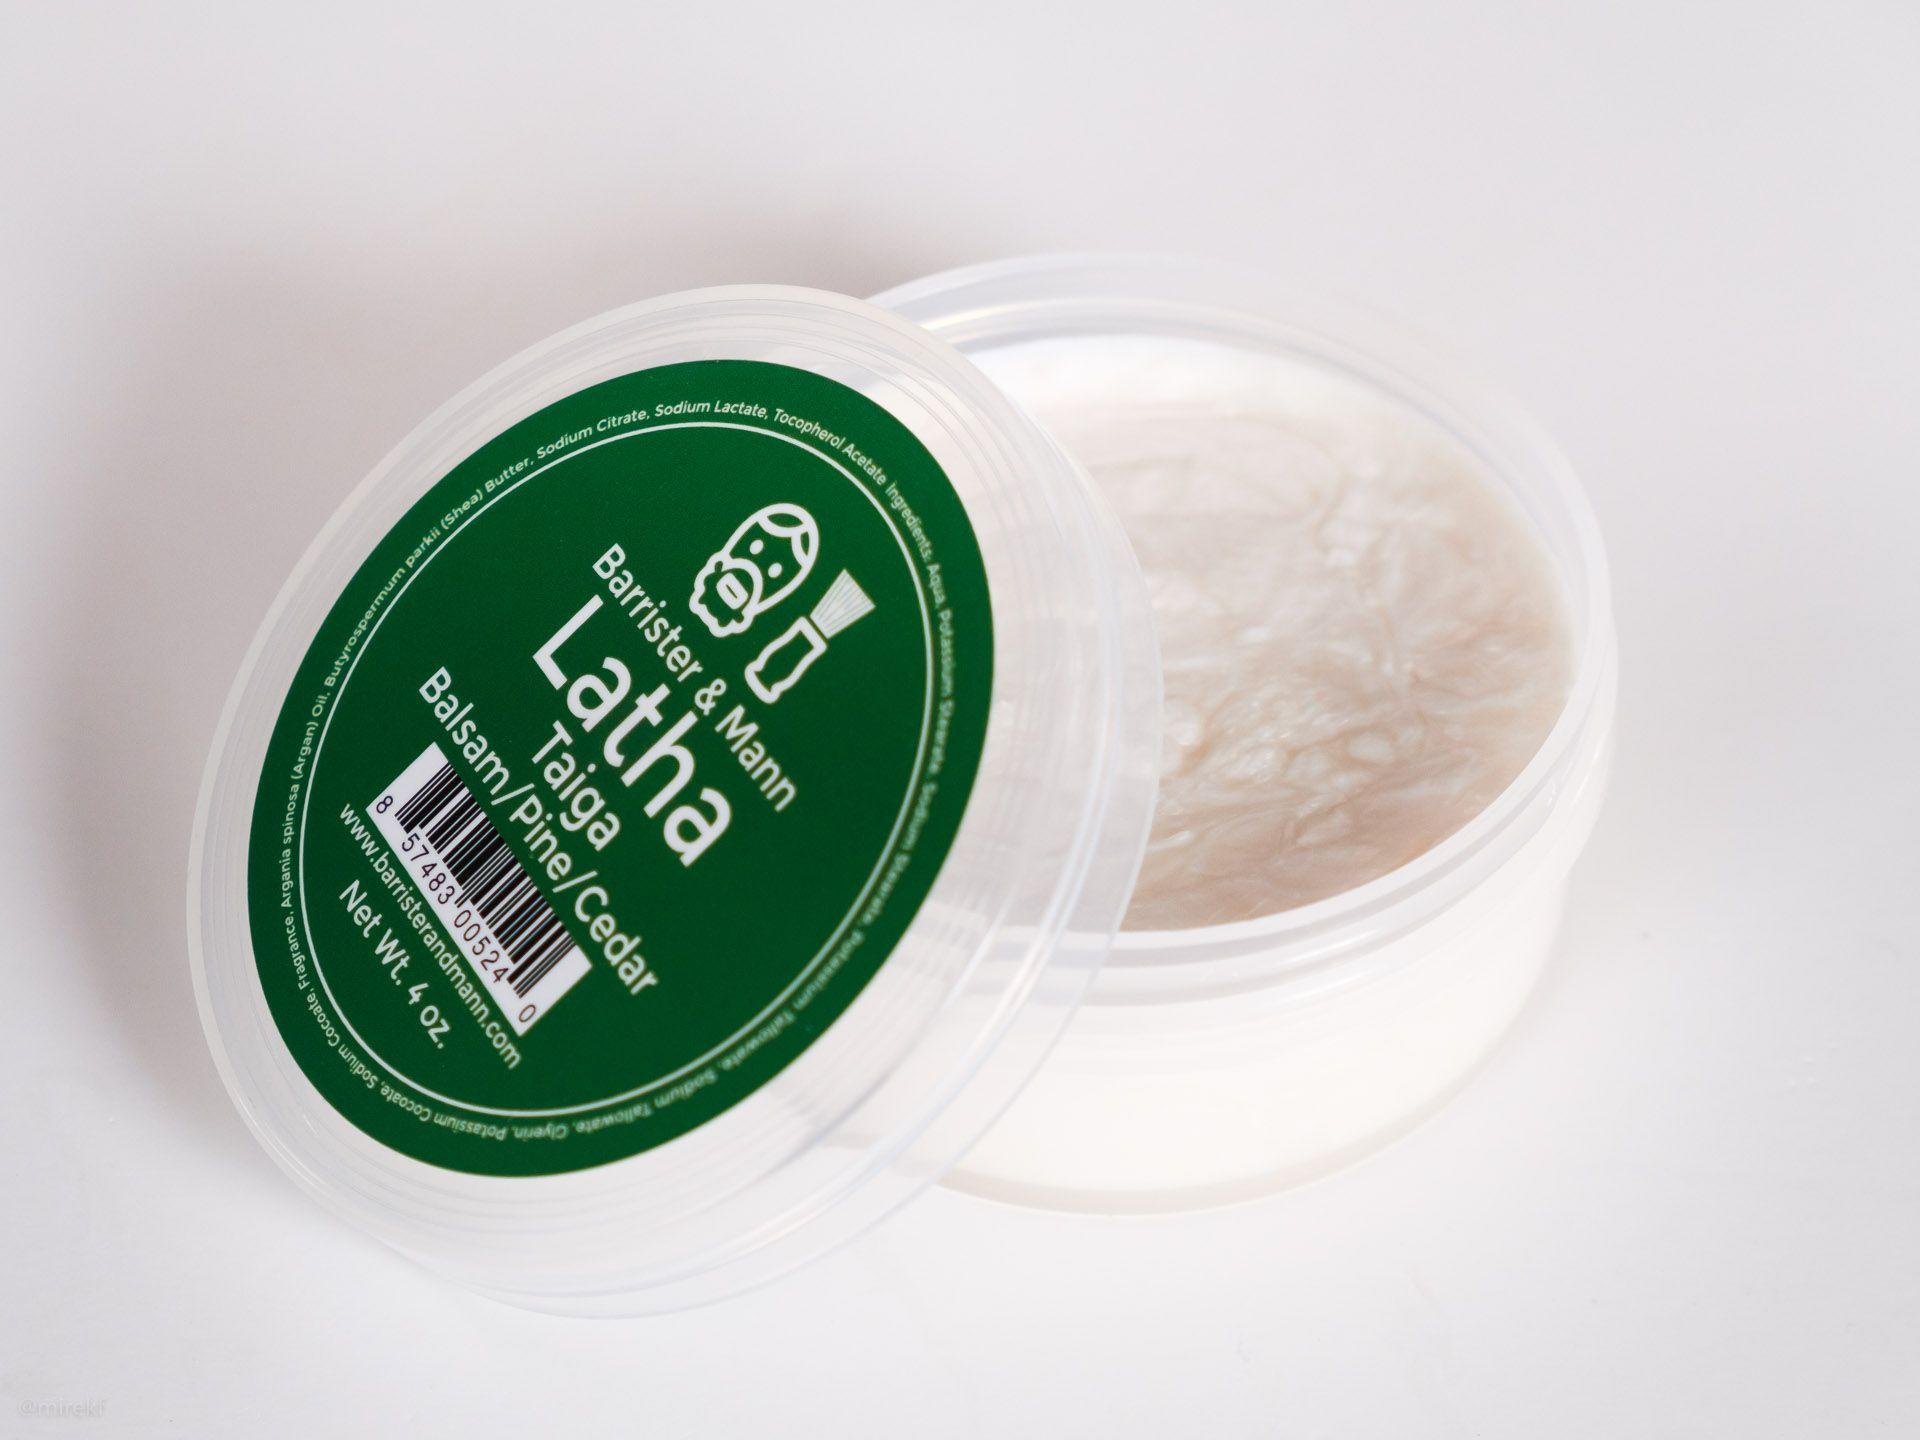 Konsystencja mydła do golenia Barrister & Mann Latha Taiga Shaving Soap